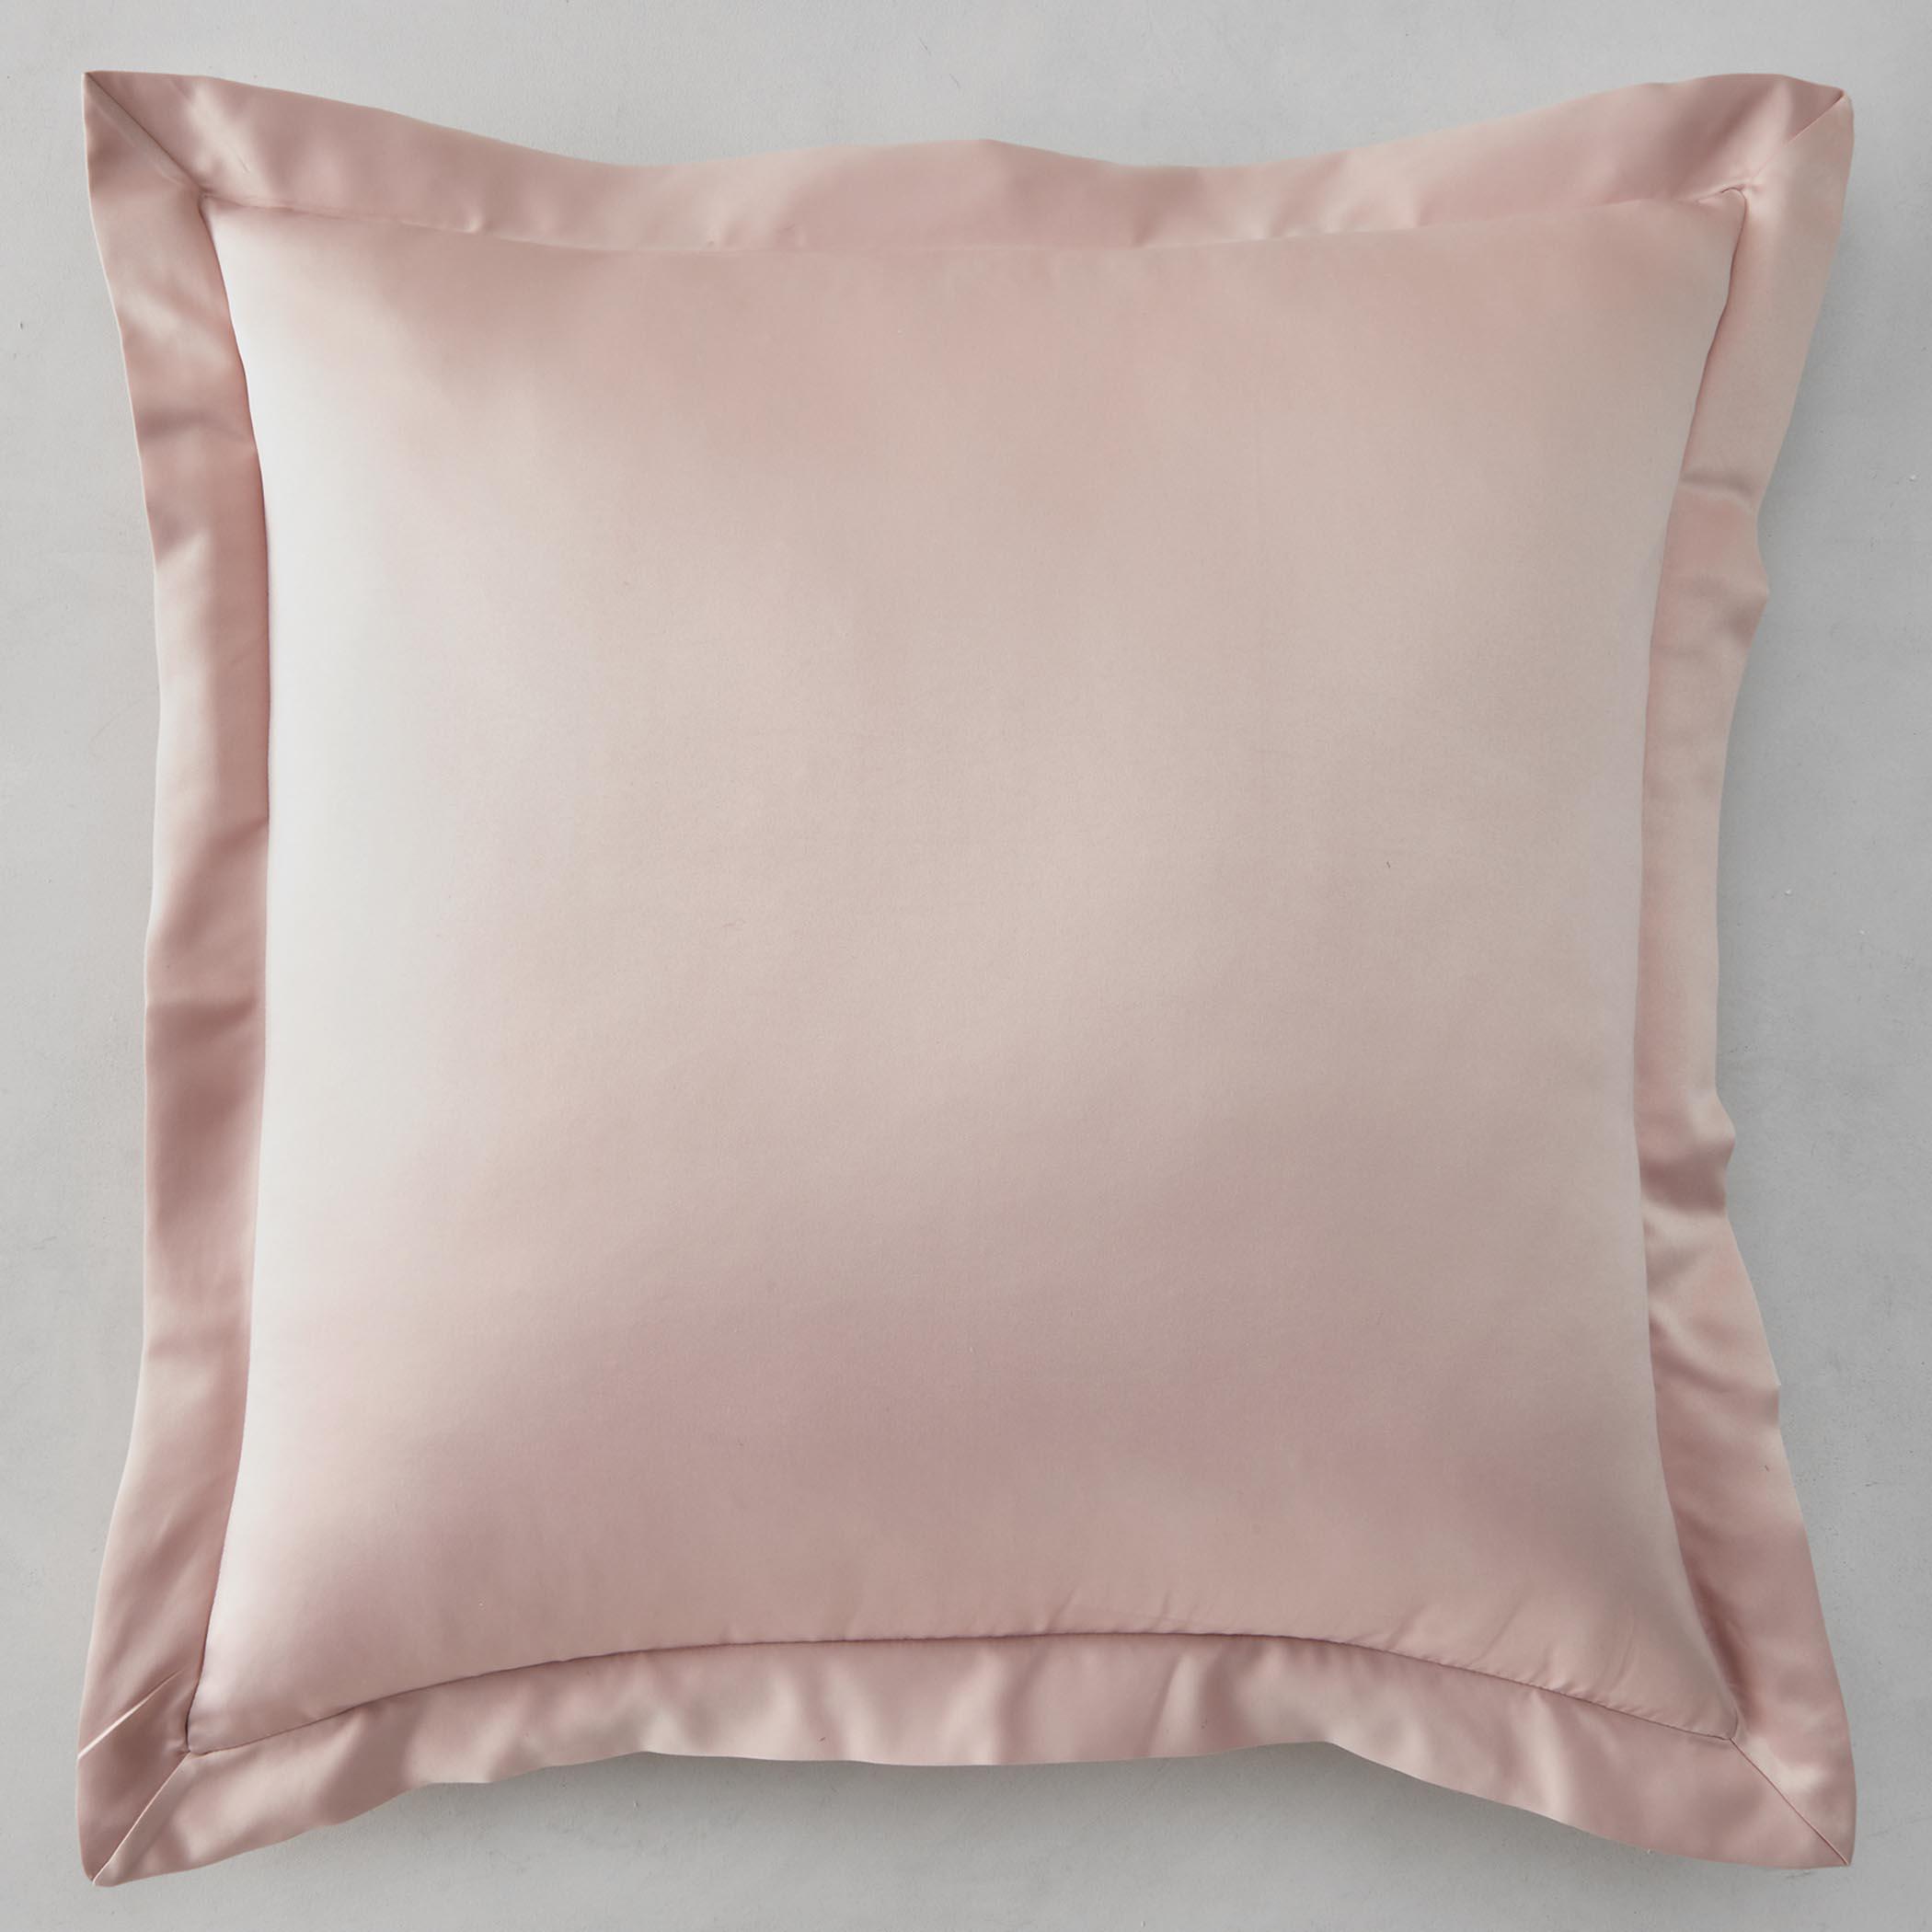 Solange Bedding - Blush